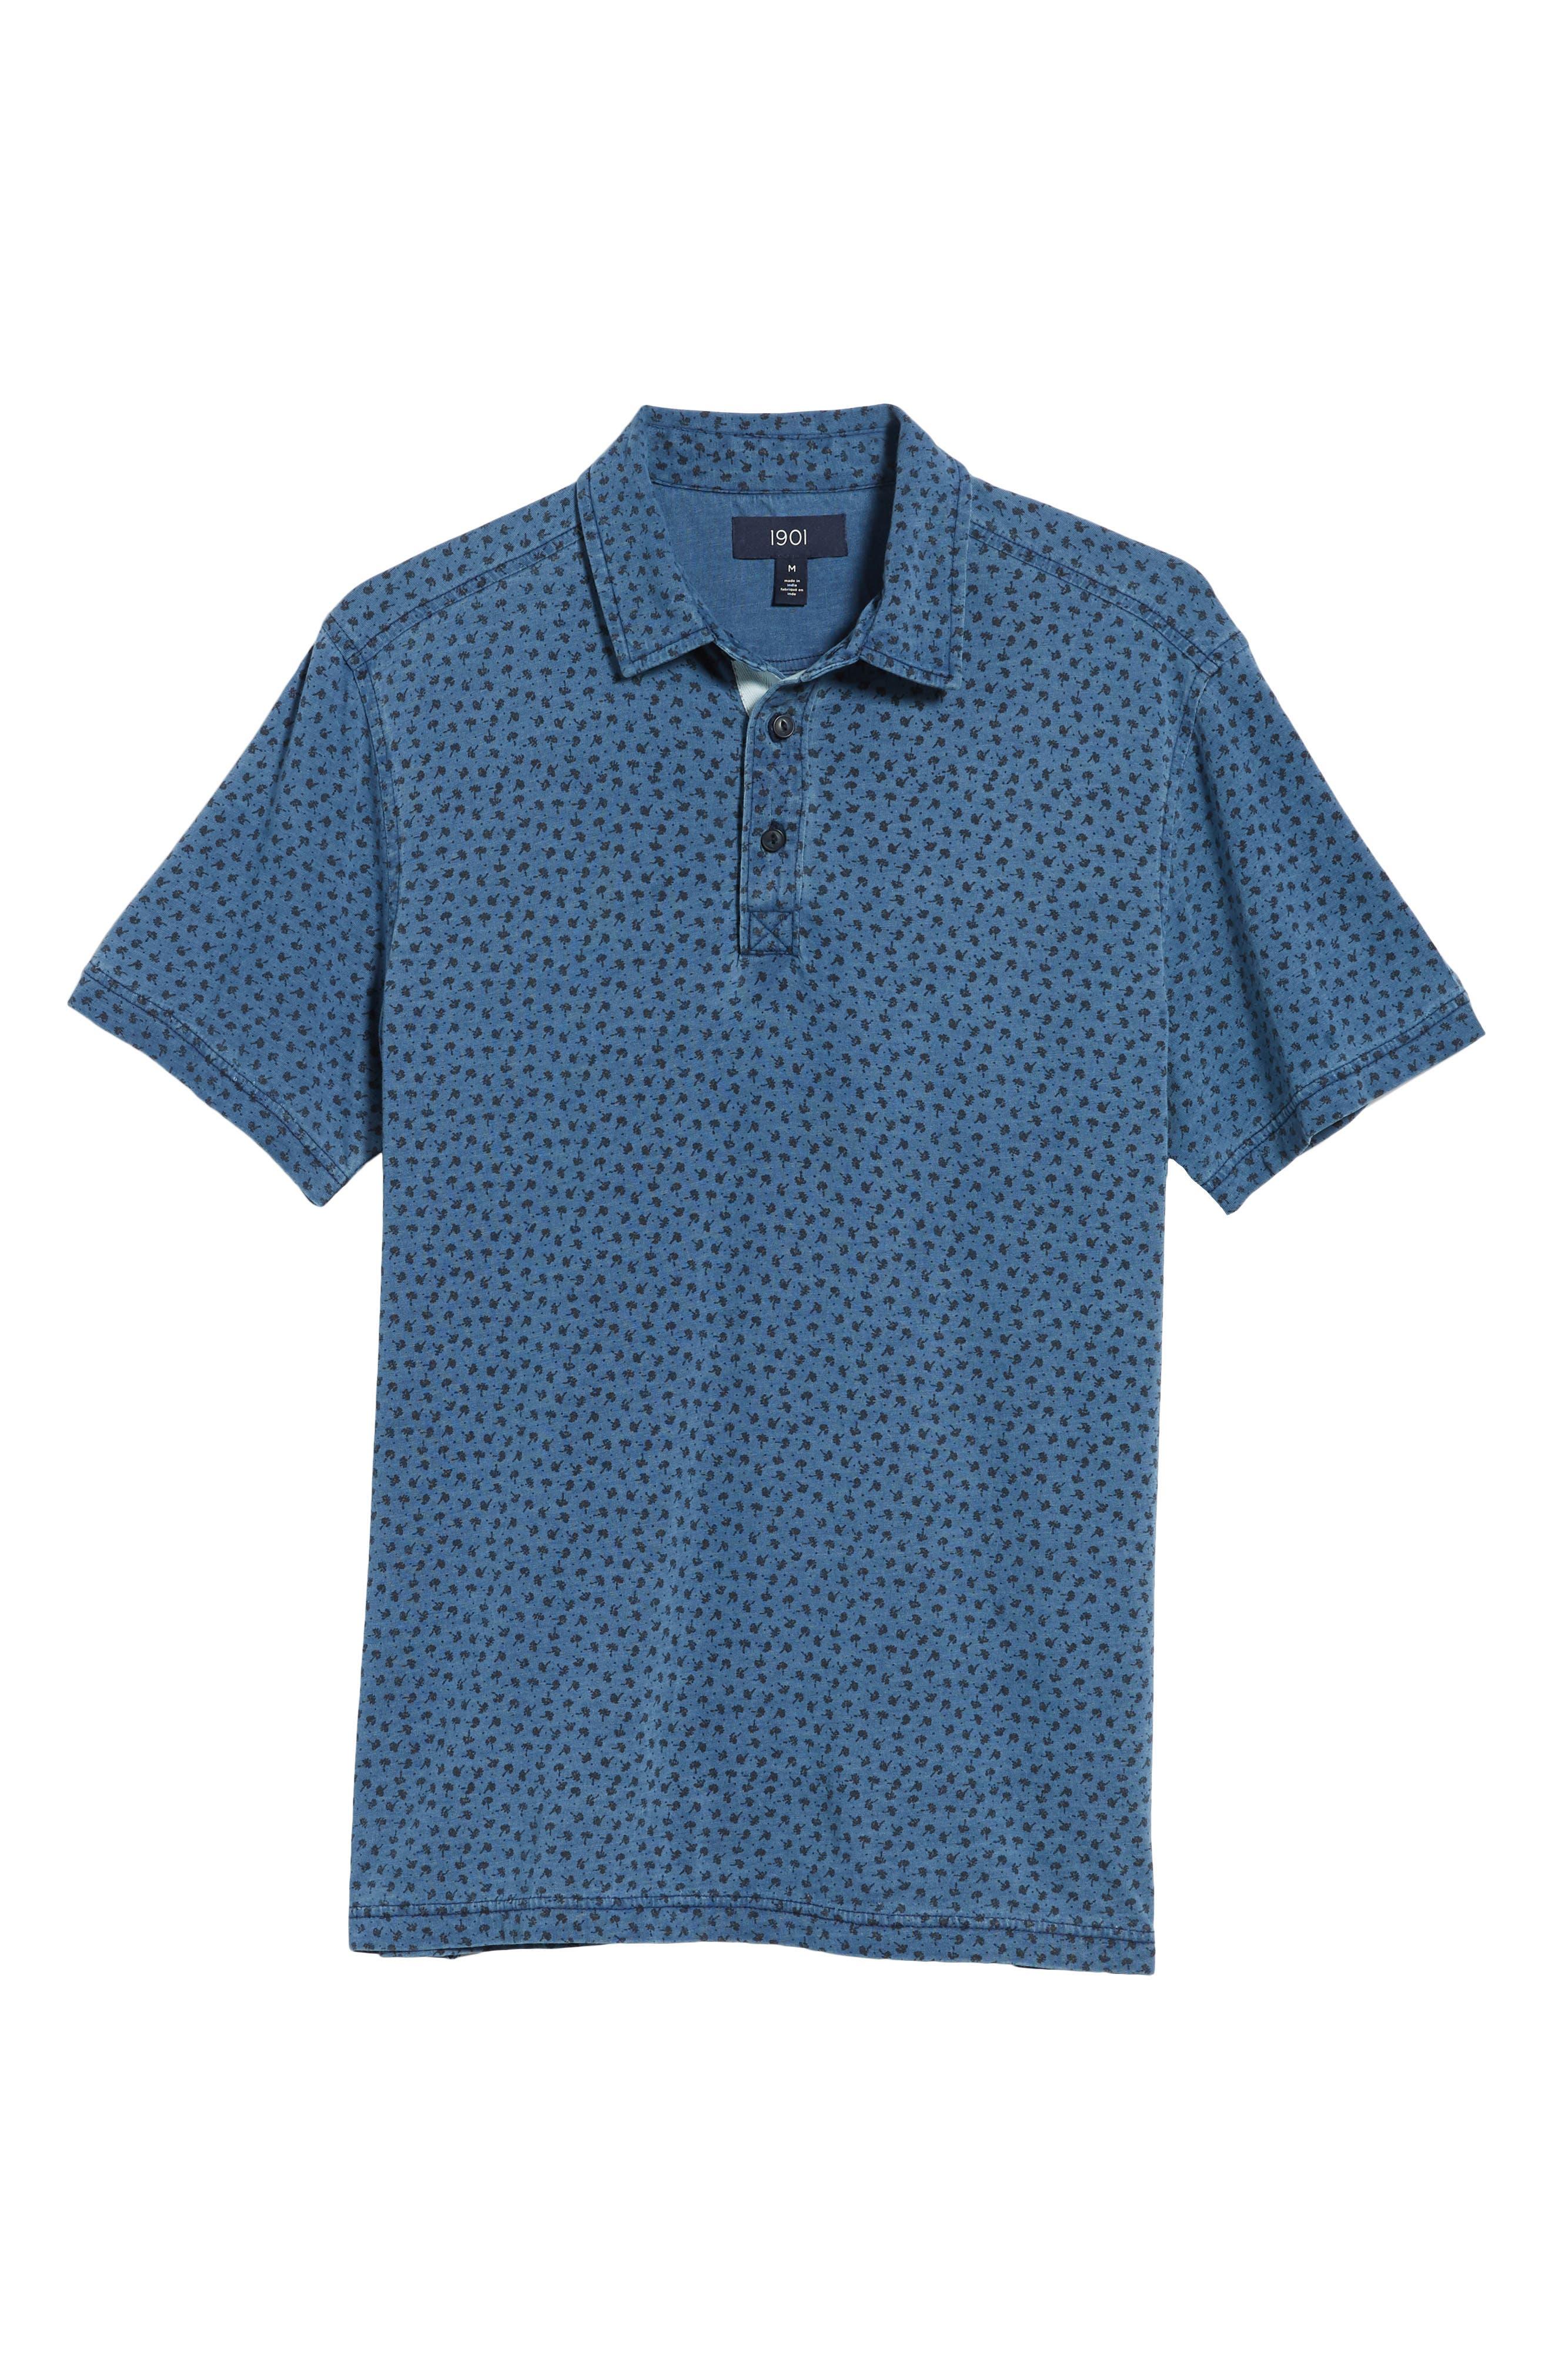 Washed Print Cotton Polo,                             Alternate thumbnail 6, color,                             Blue Indigo Print